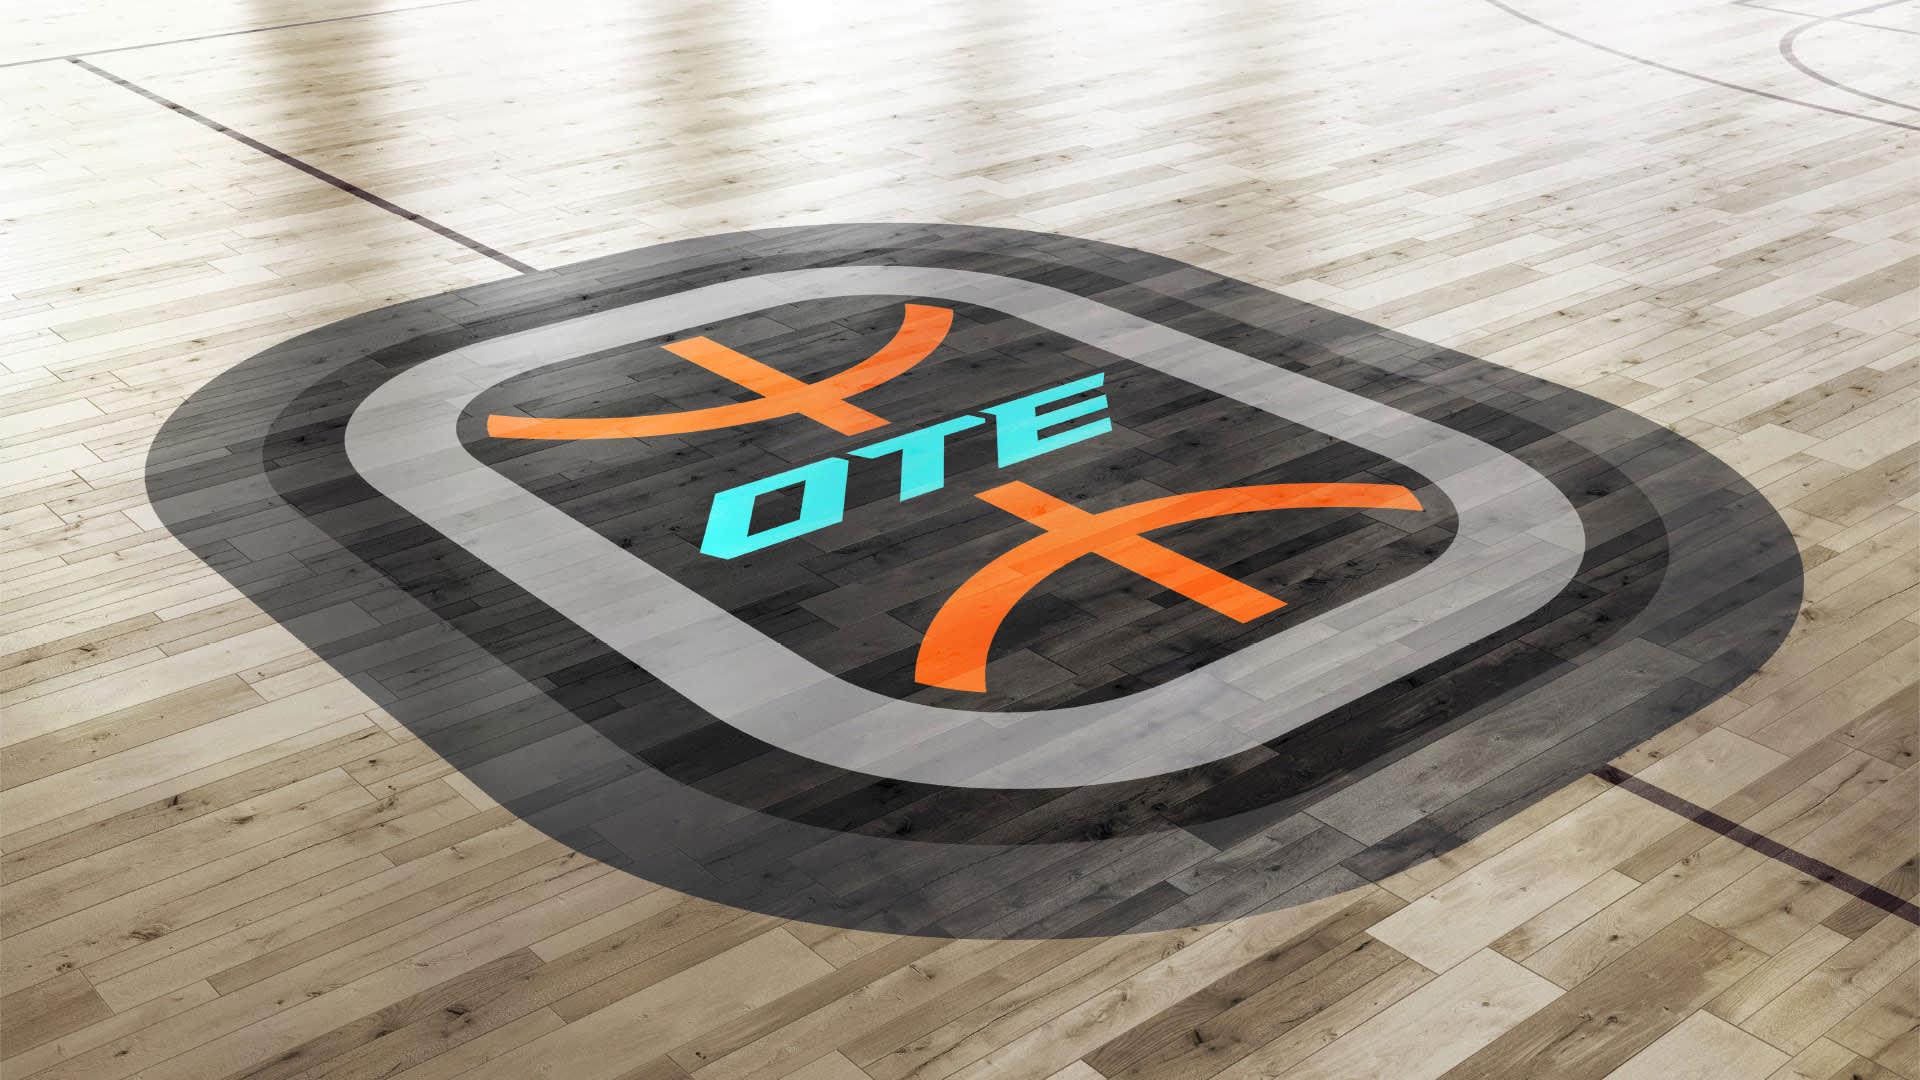 An Overtime logo on a basketball court